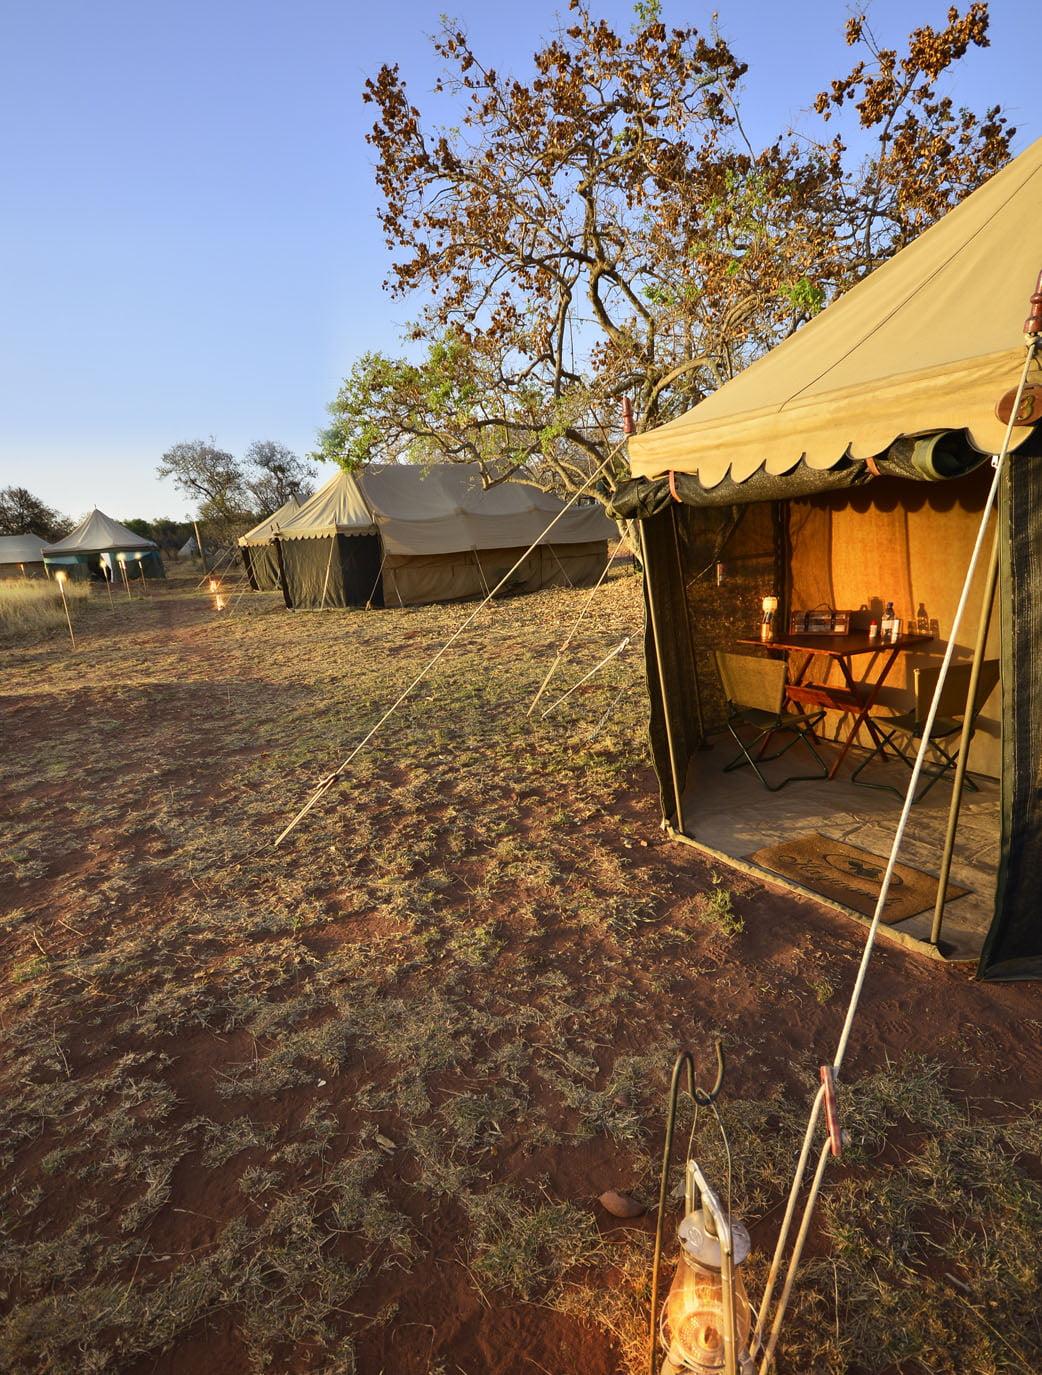 Kalahari Transfrontier Park